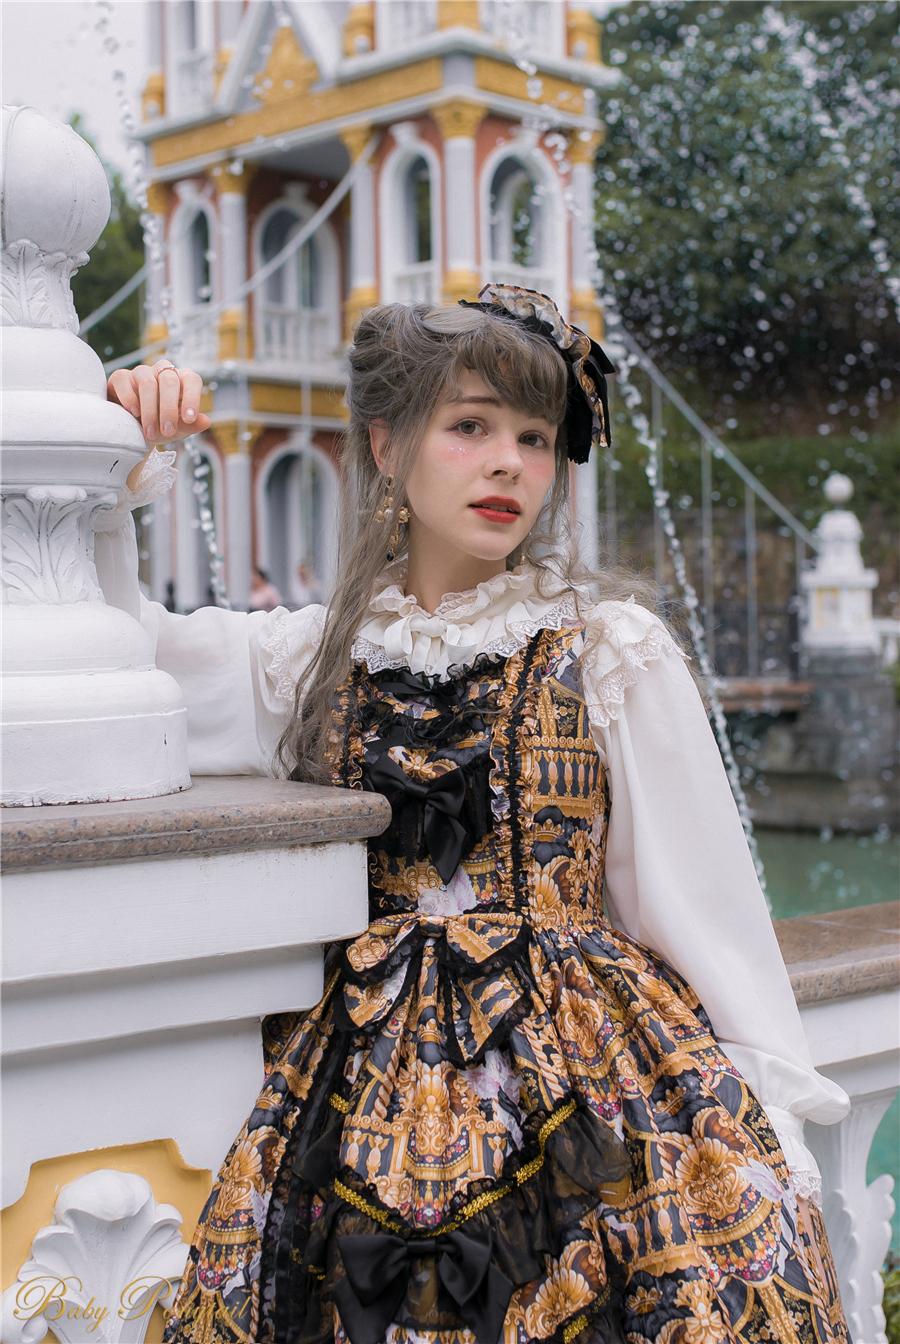 Babyponytail_Model_JSK_Black Present Angel_Claudia_2_5.jpg